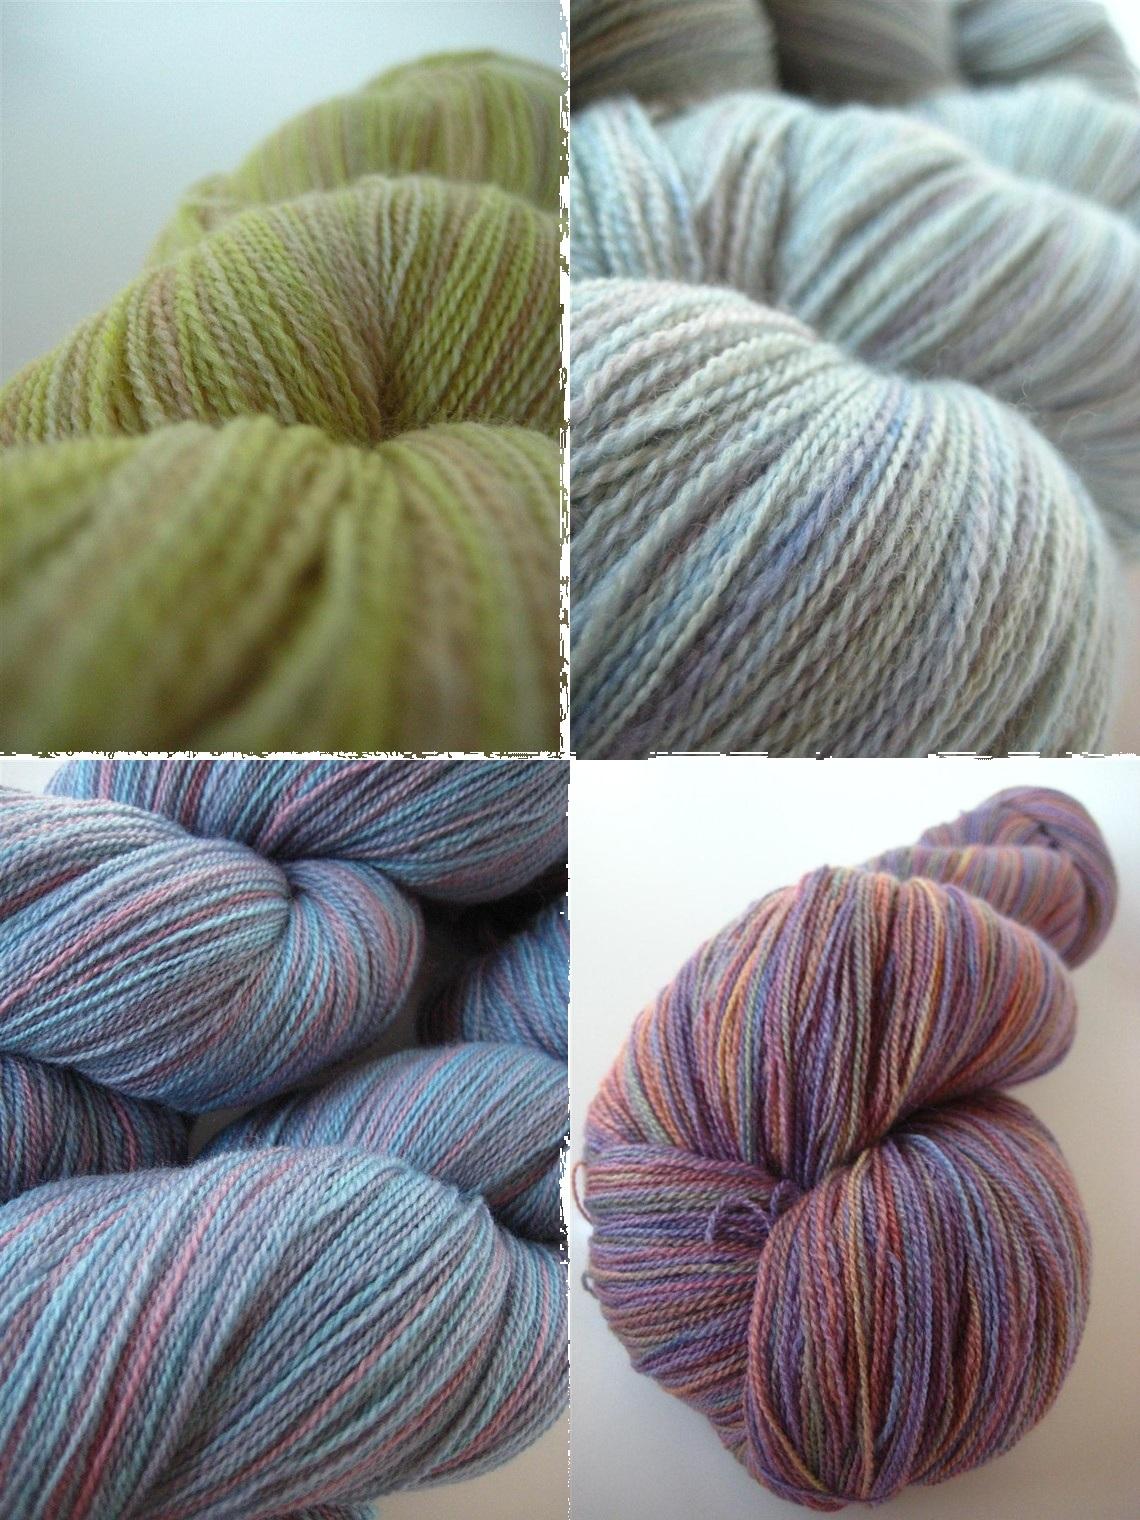 hand-dyed, handdyed, yarn, lace weight, silk, merino, knitting, crochet